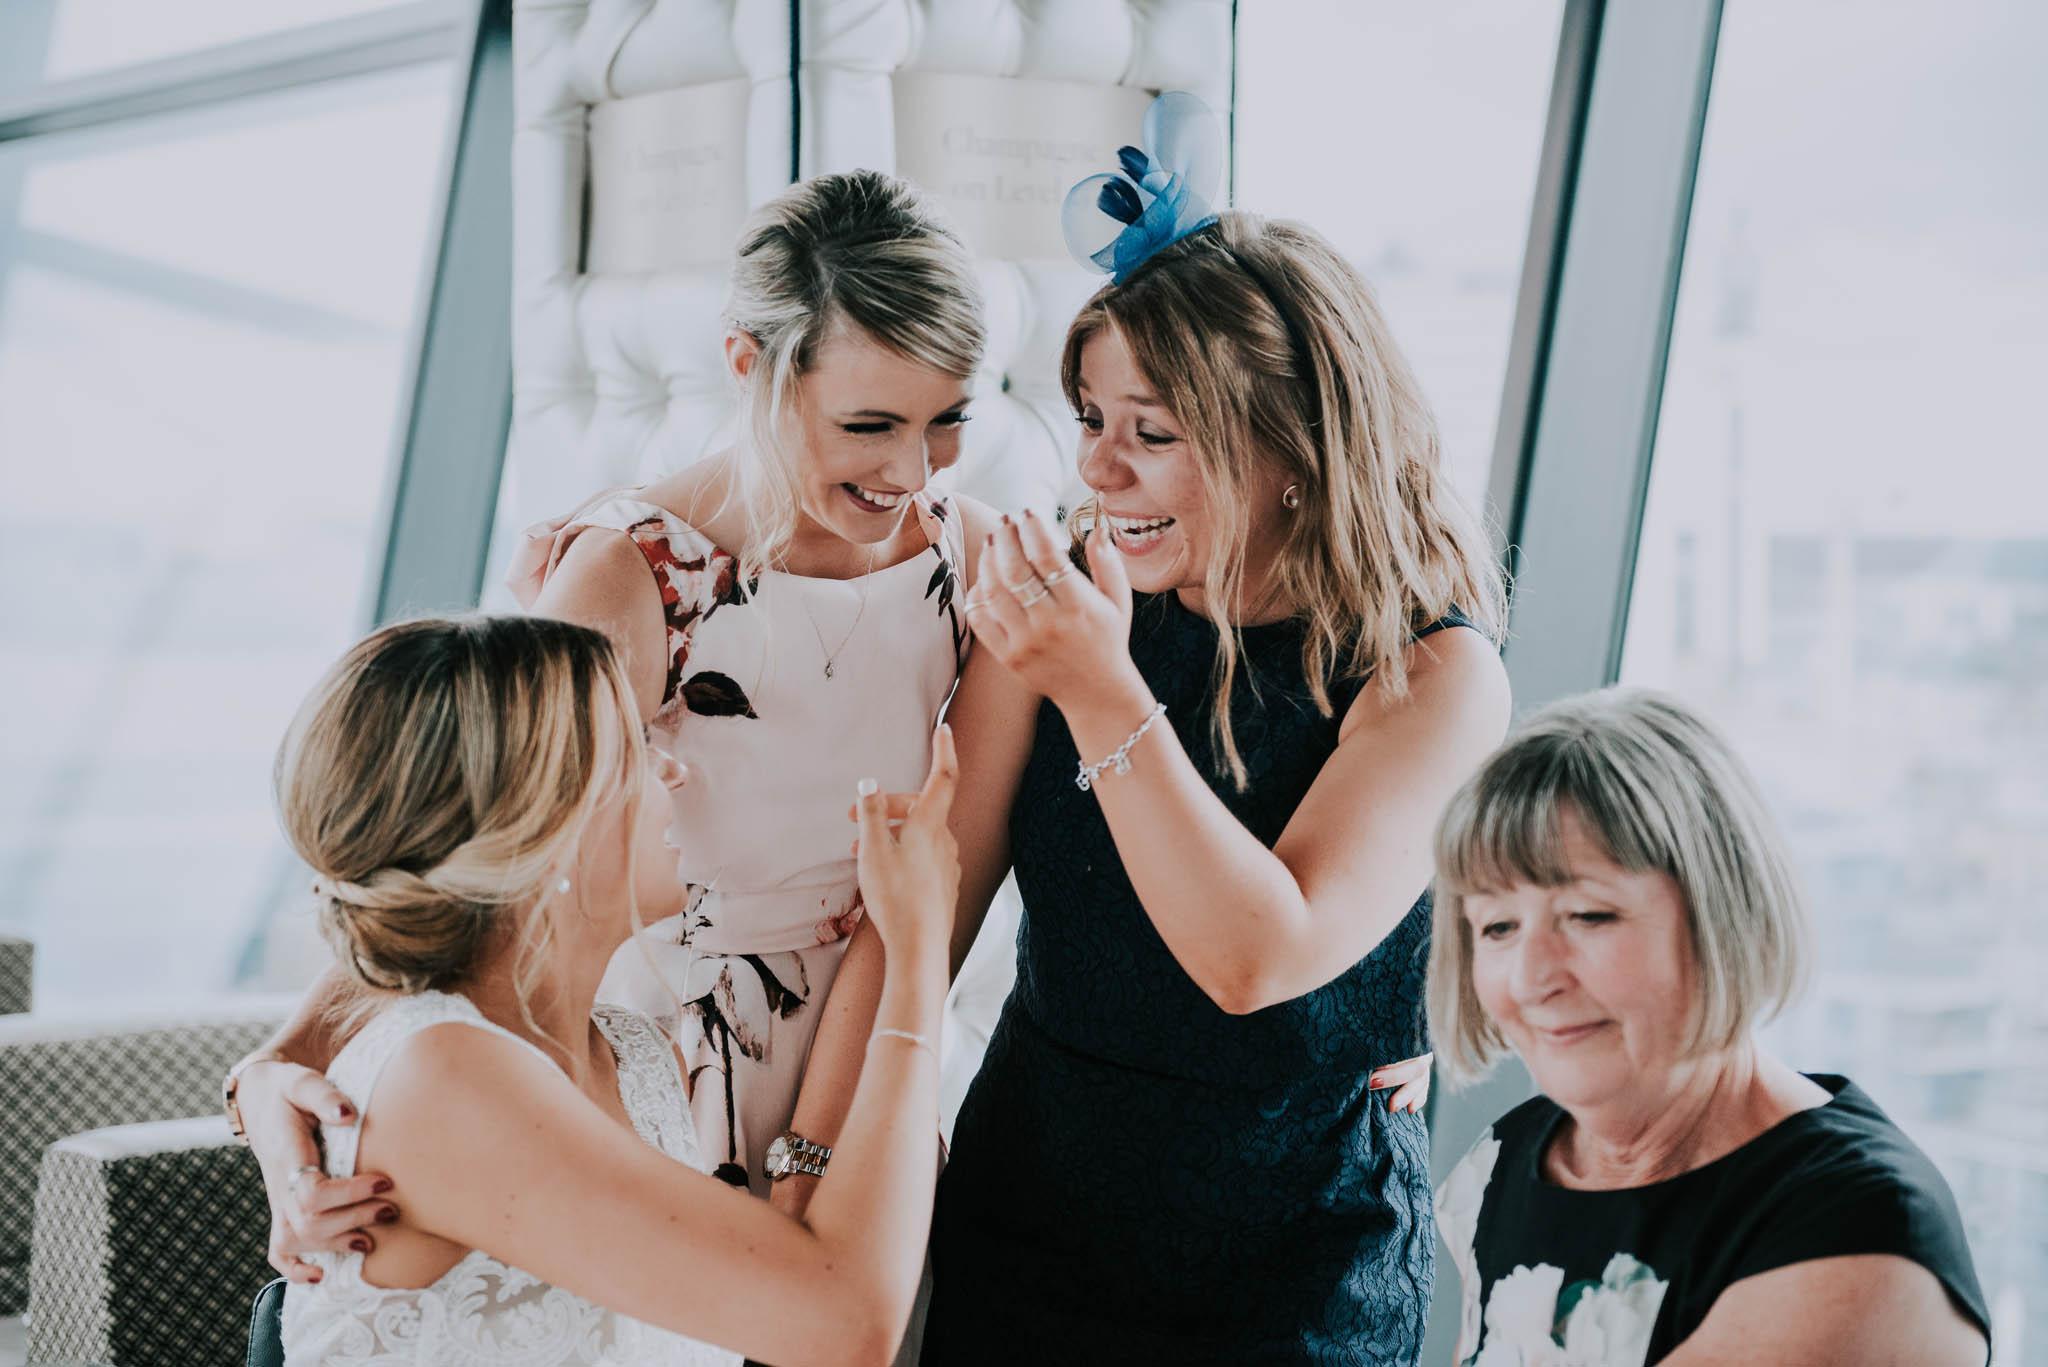 crying-wedding-blog-scott-stockwell-photography-end-2017.jpg